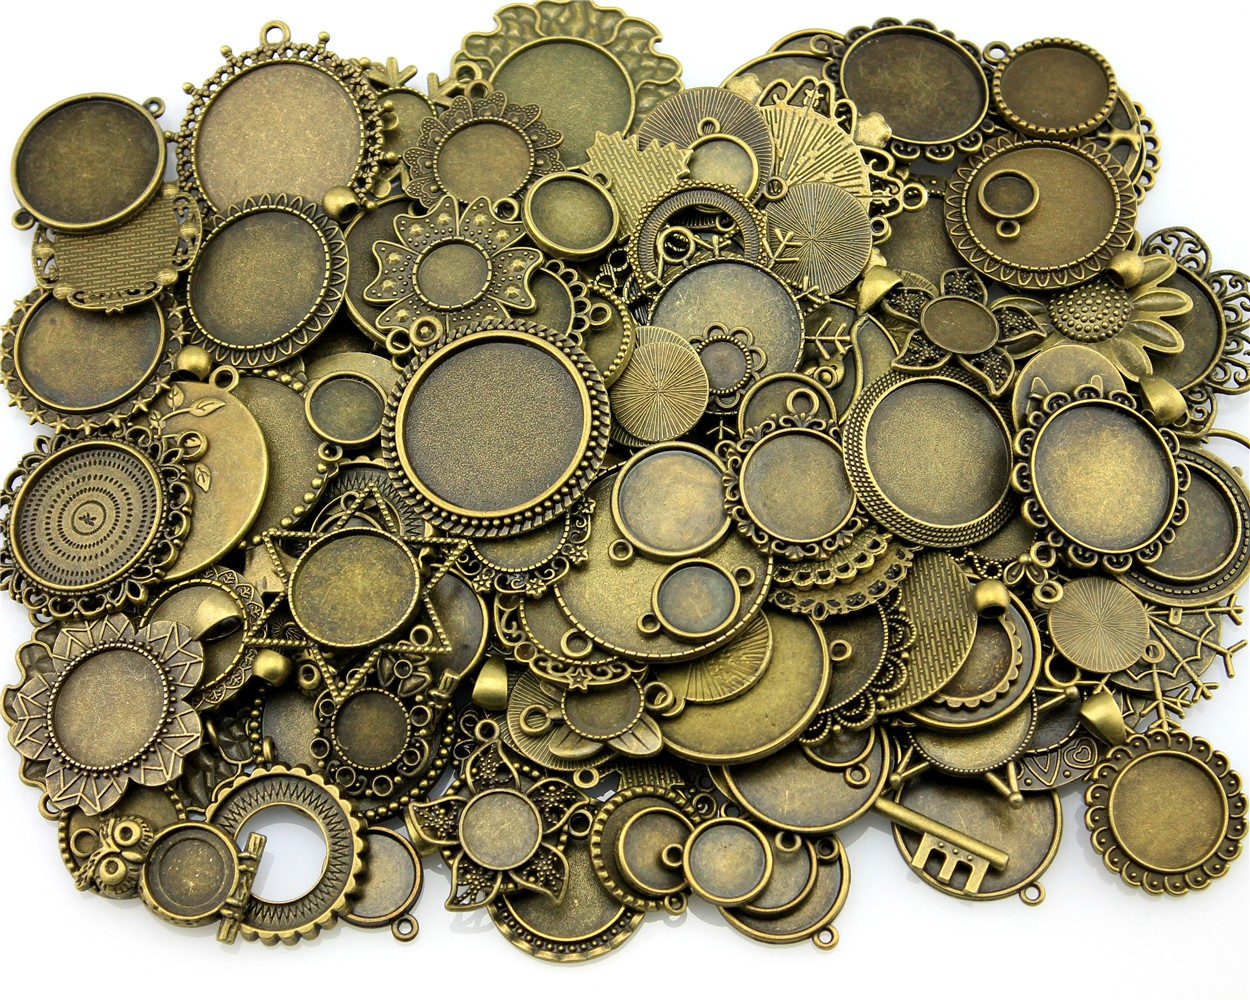 100Gram Mix Designs Antique Bronze & Antique Zinc Alloy Pendant Blank Cameo Cabochon Base Setting Jewelry Accessories